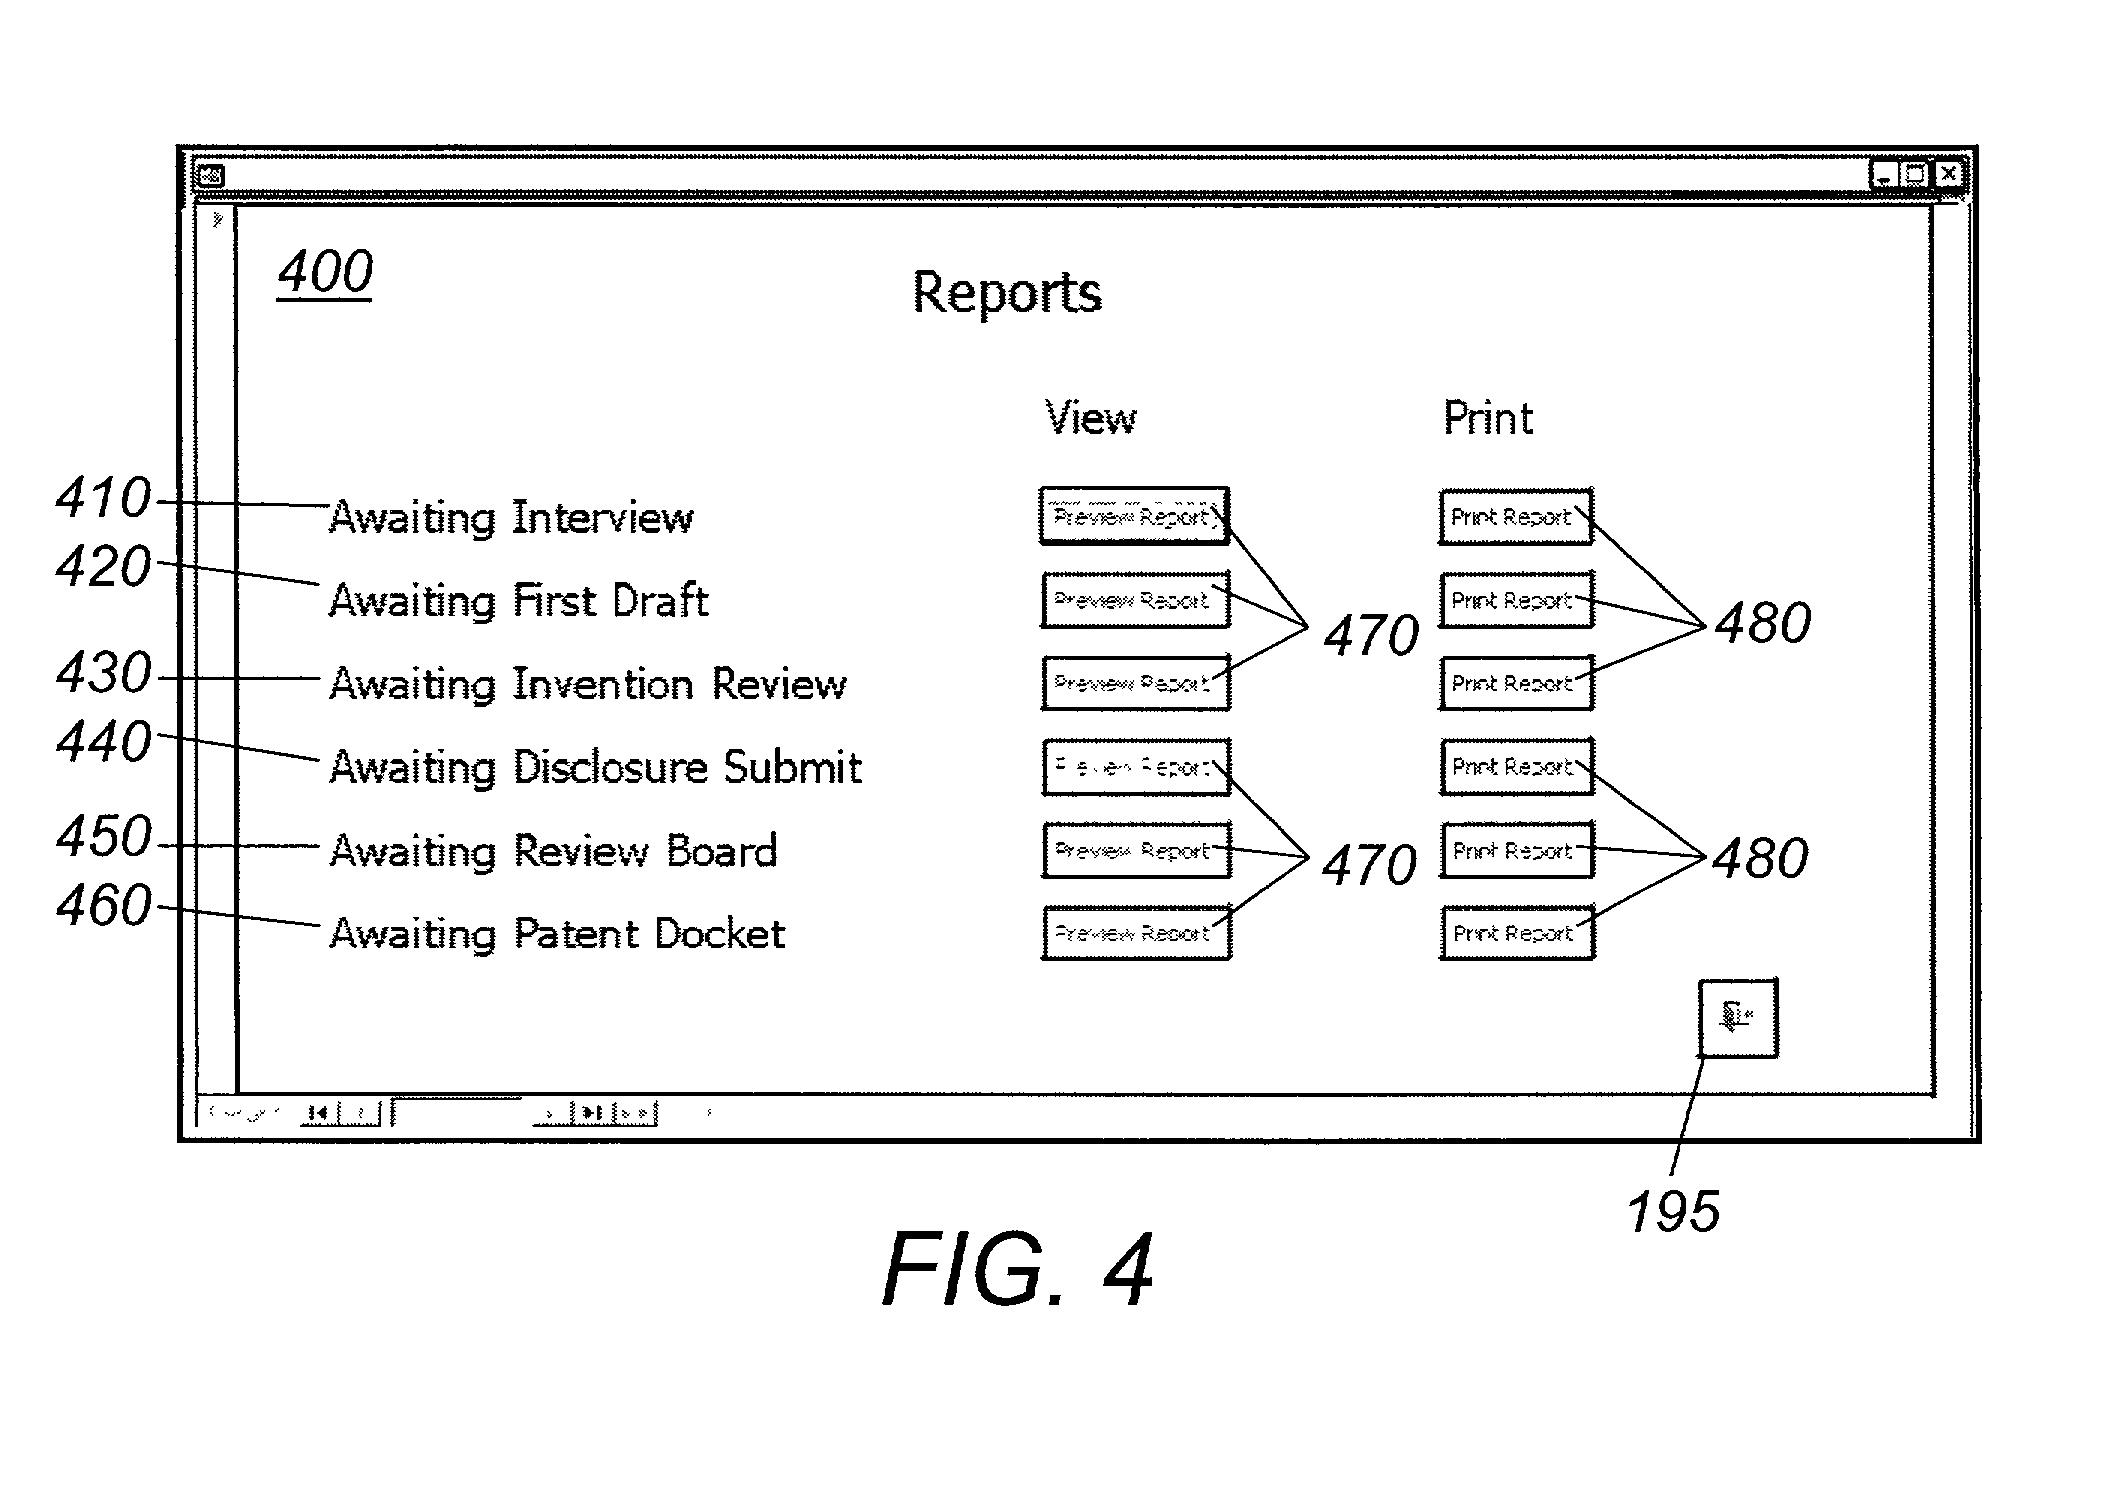 patent docket